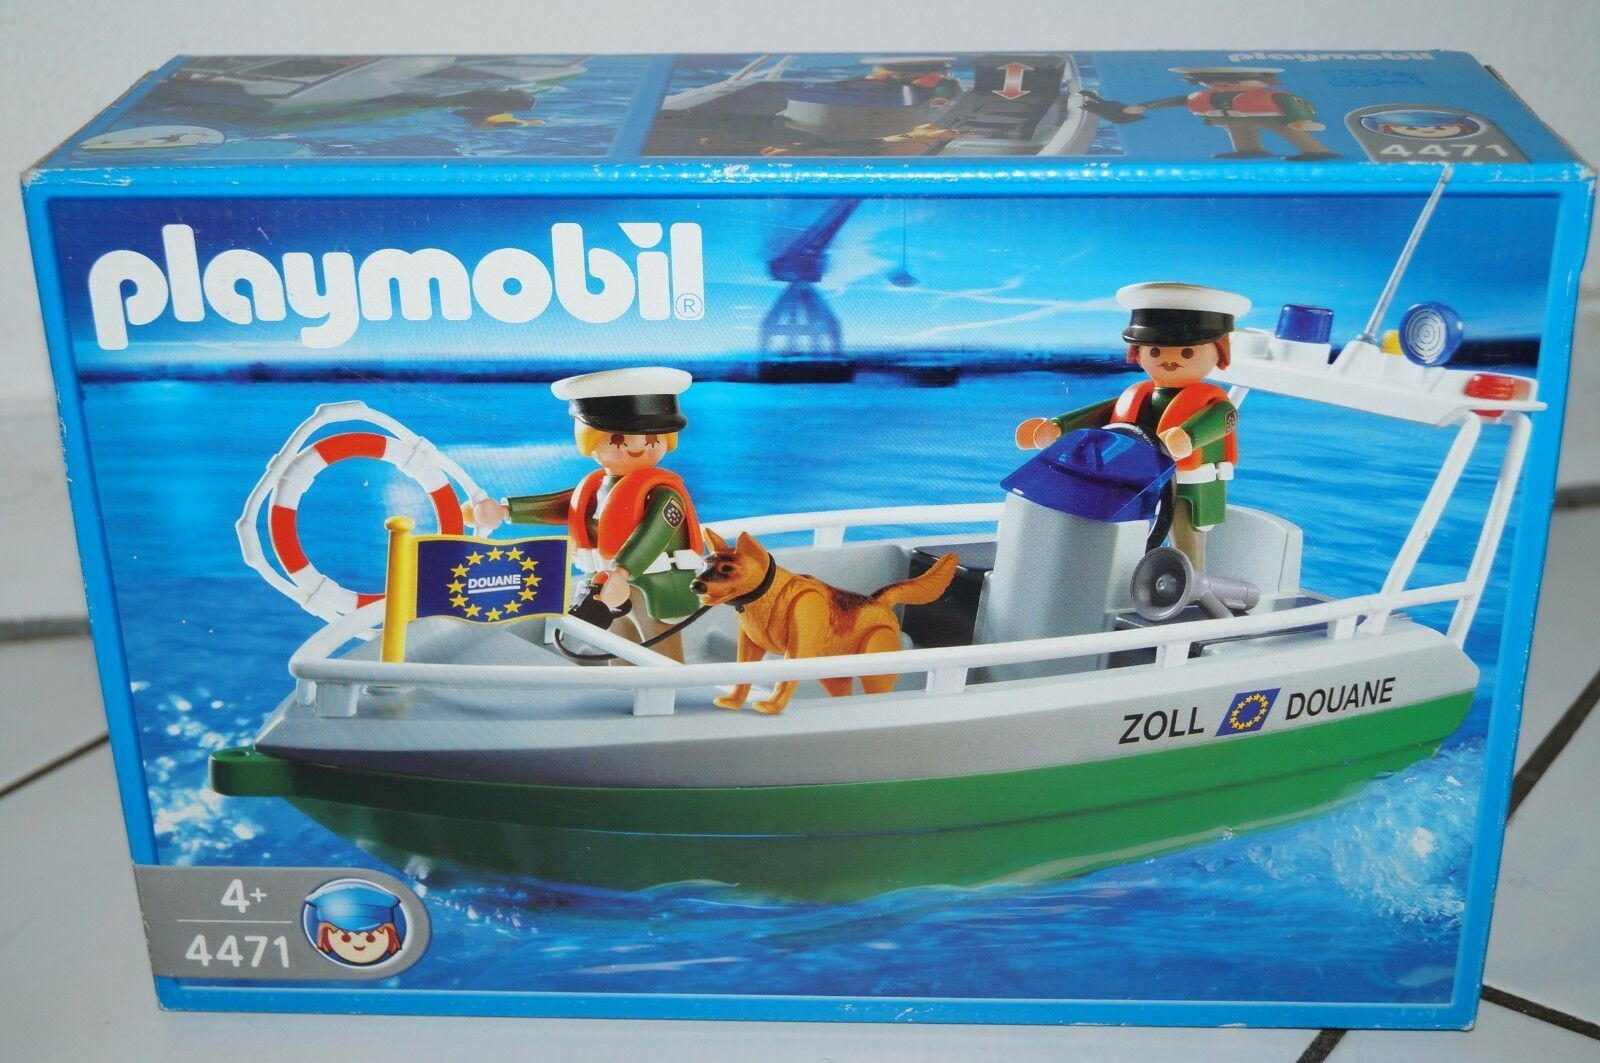 Playmobil 4471 Hafen Zollschiff bei Playmobil Containerschiff